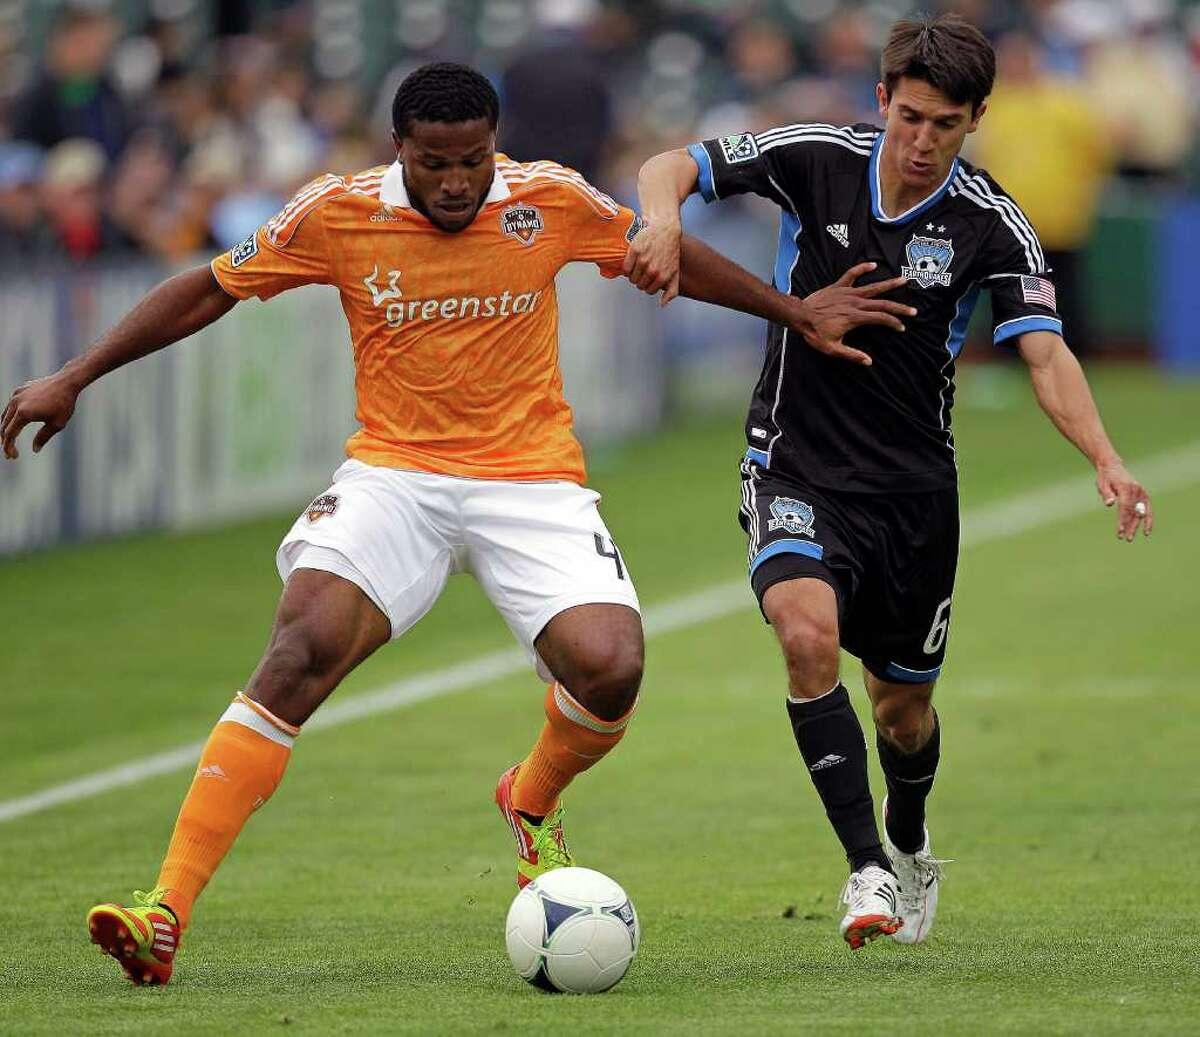 Dynamo defender Jermaine Taylor, left, battles the Earthquakes' Shea Salinas.